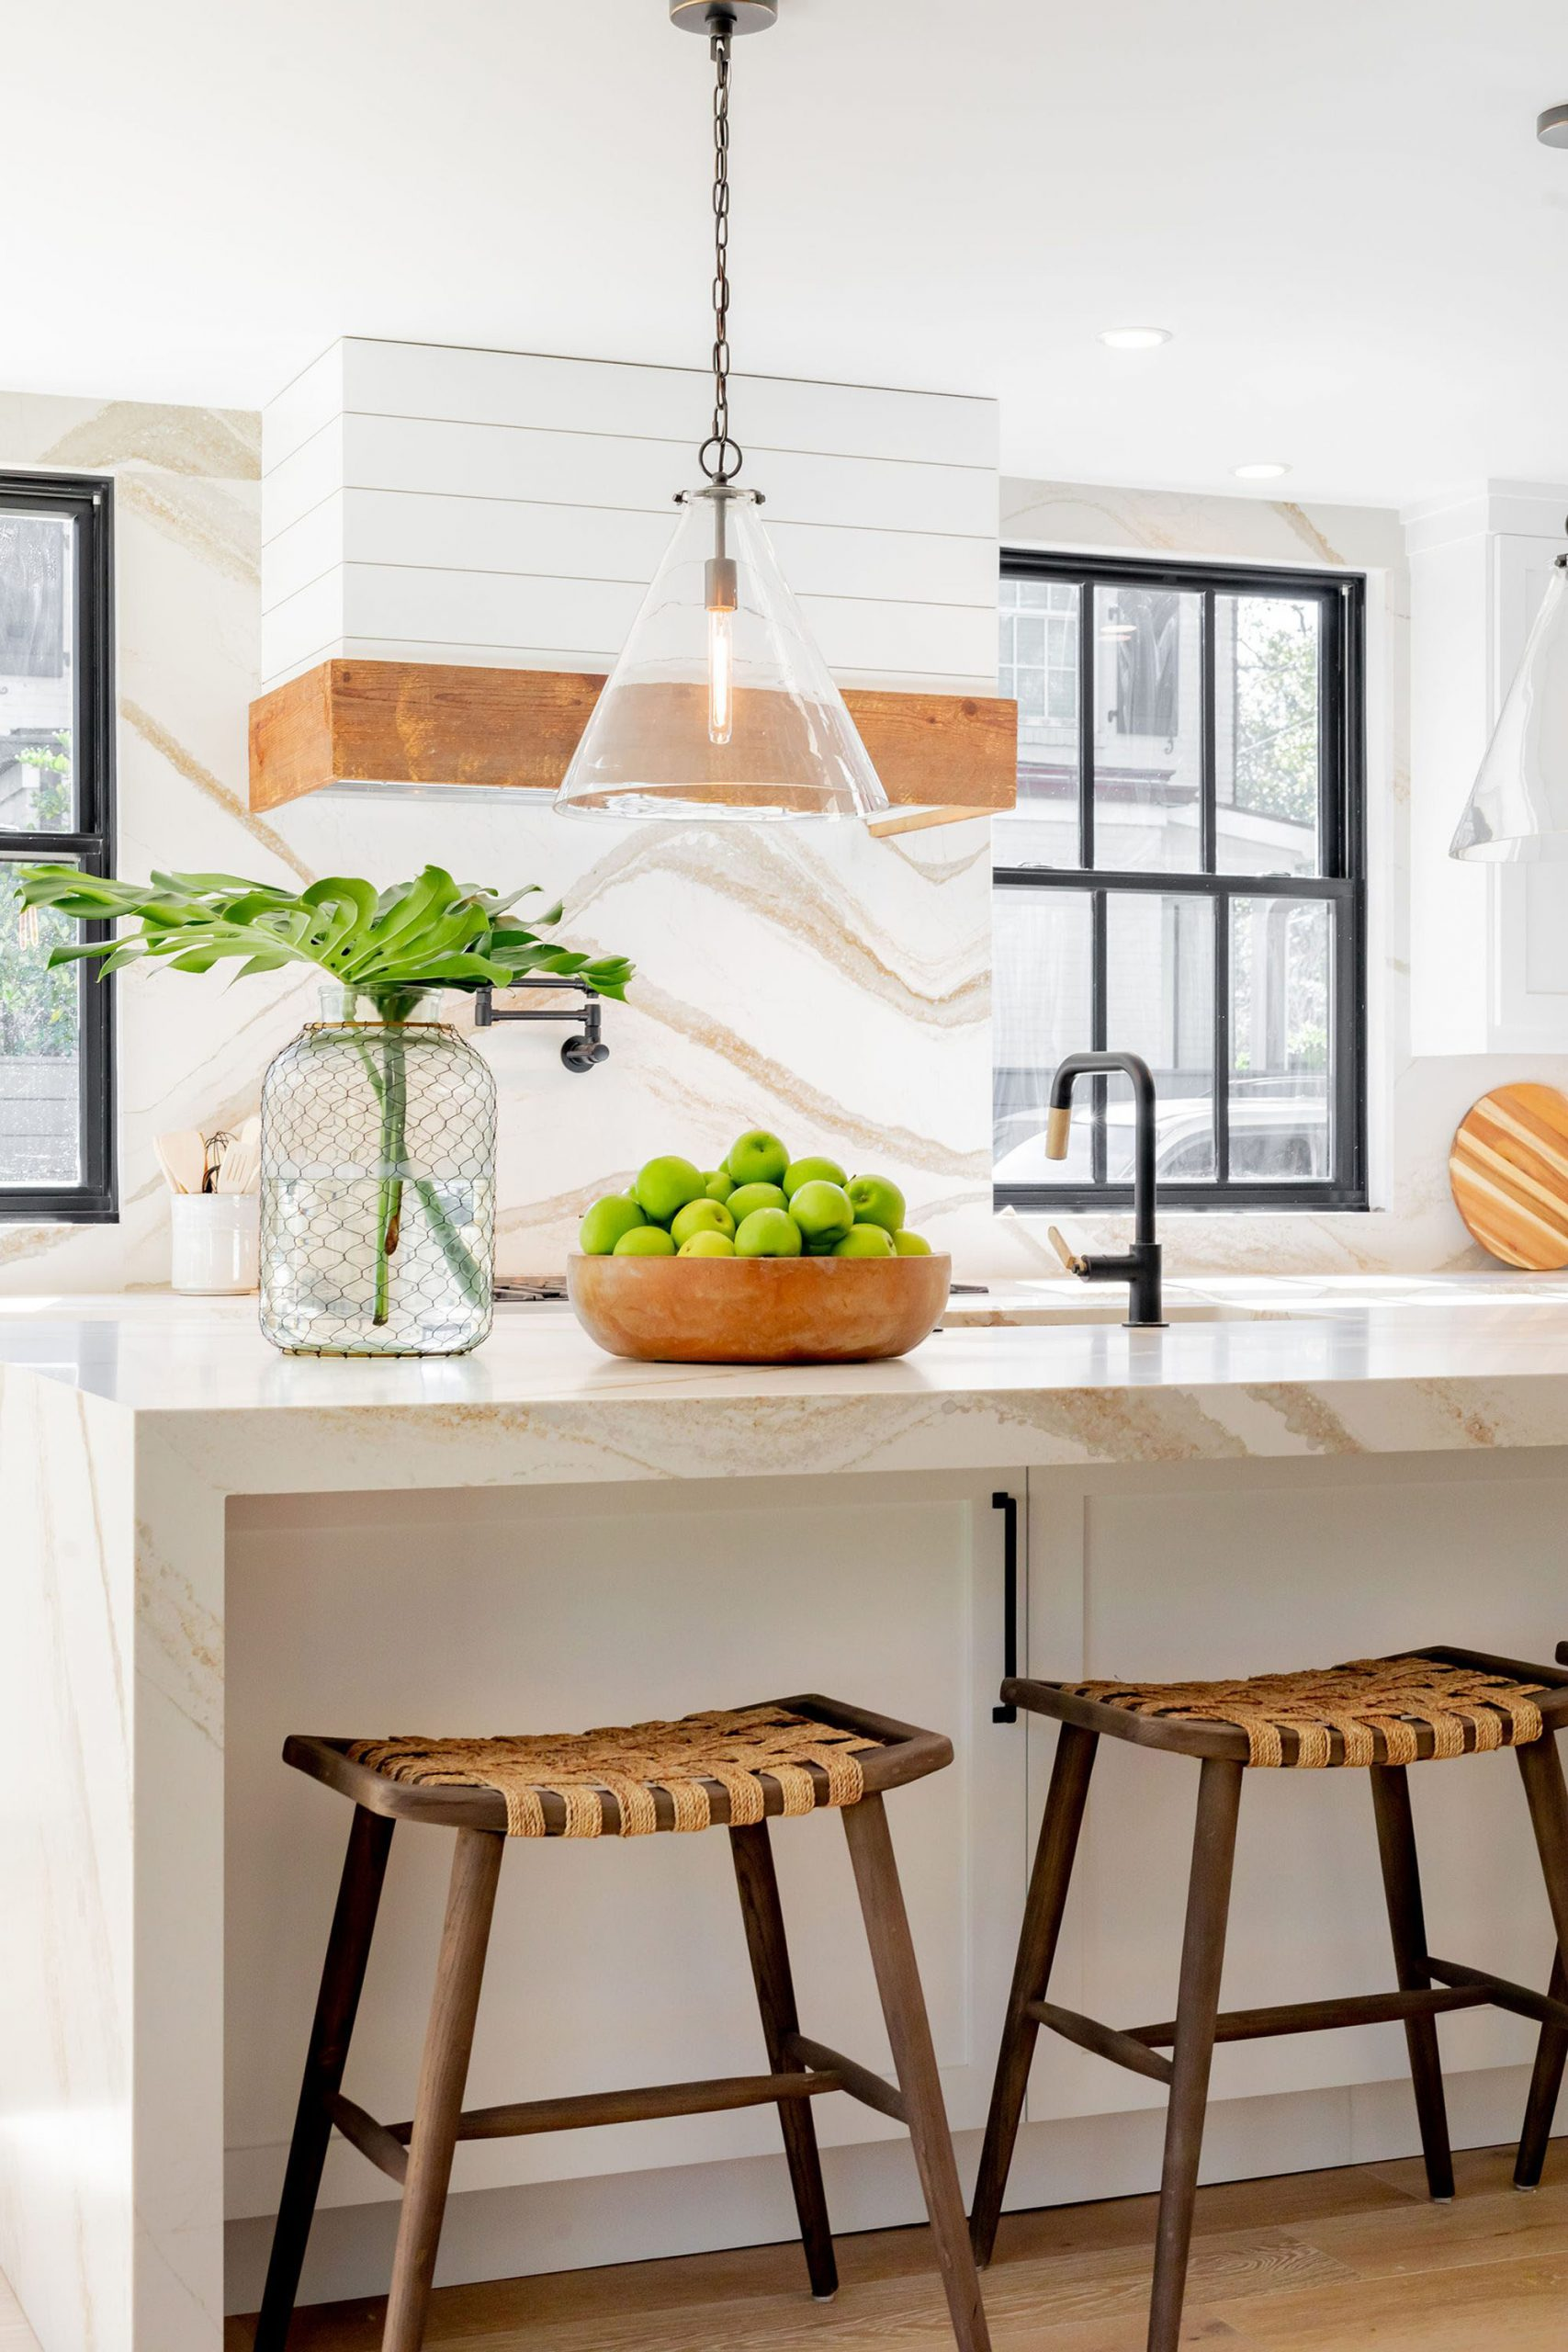 fabulous custom kitchen. solid marble slab counters and backsplash. custom shiplap and wood range hood.